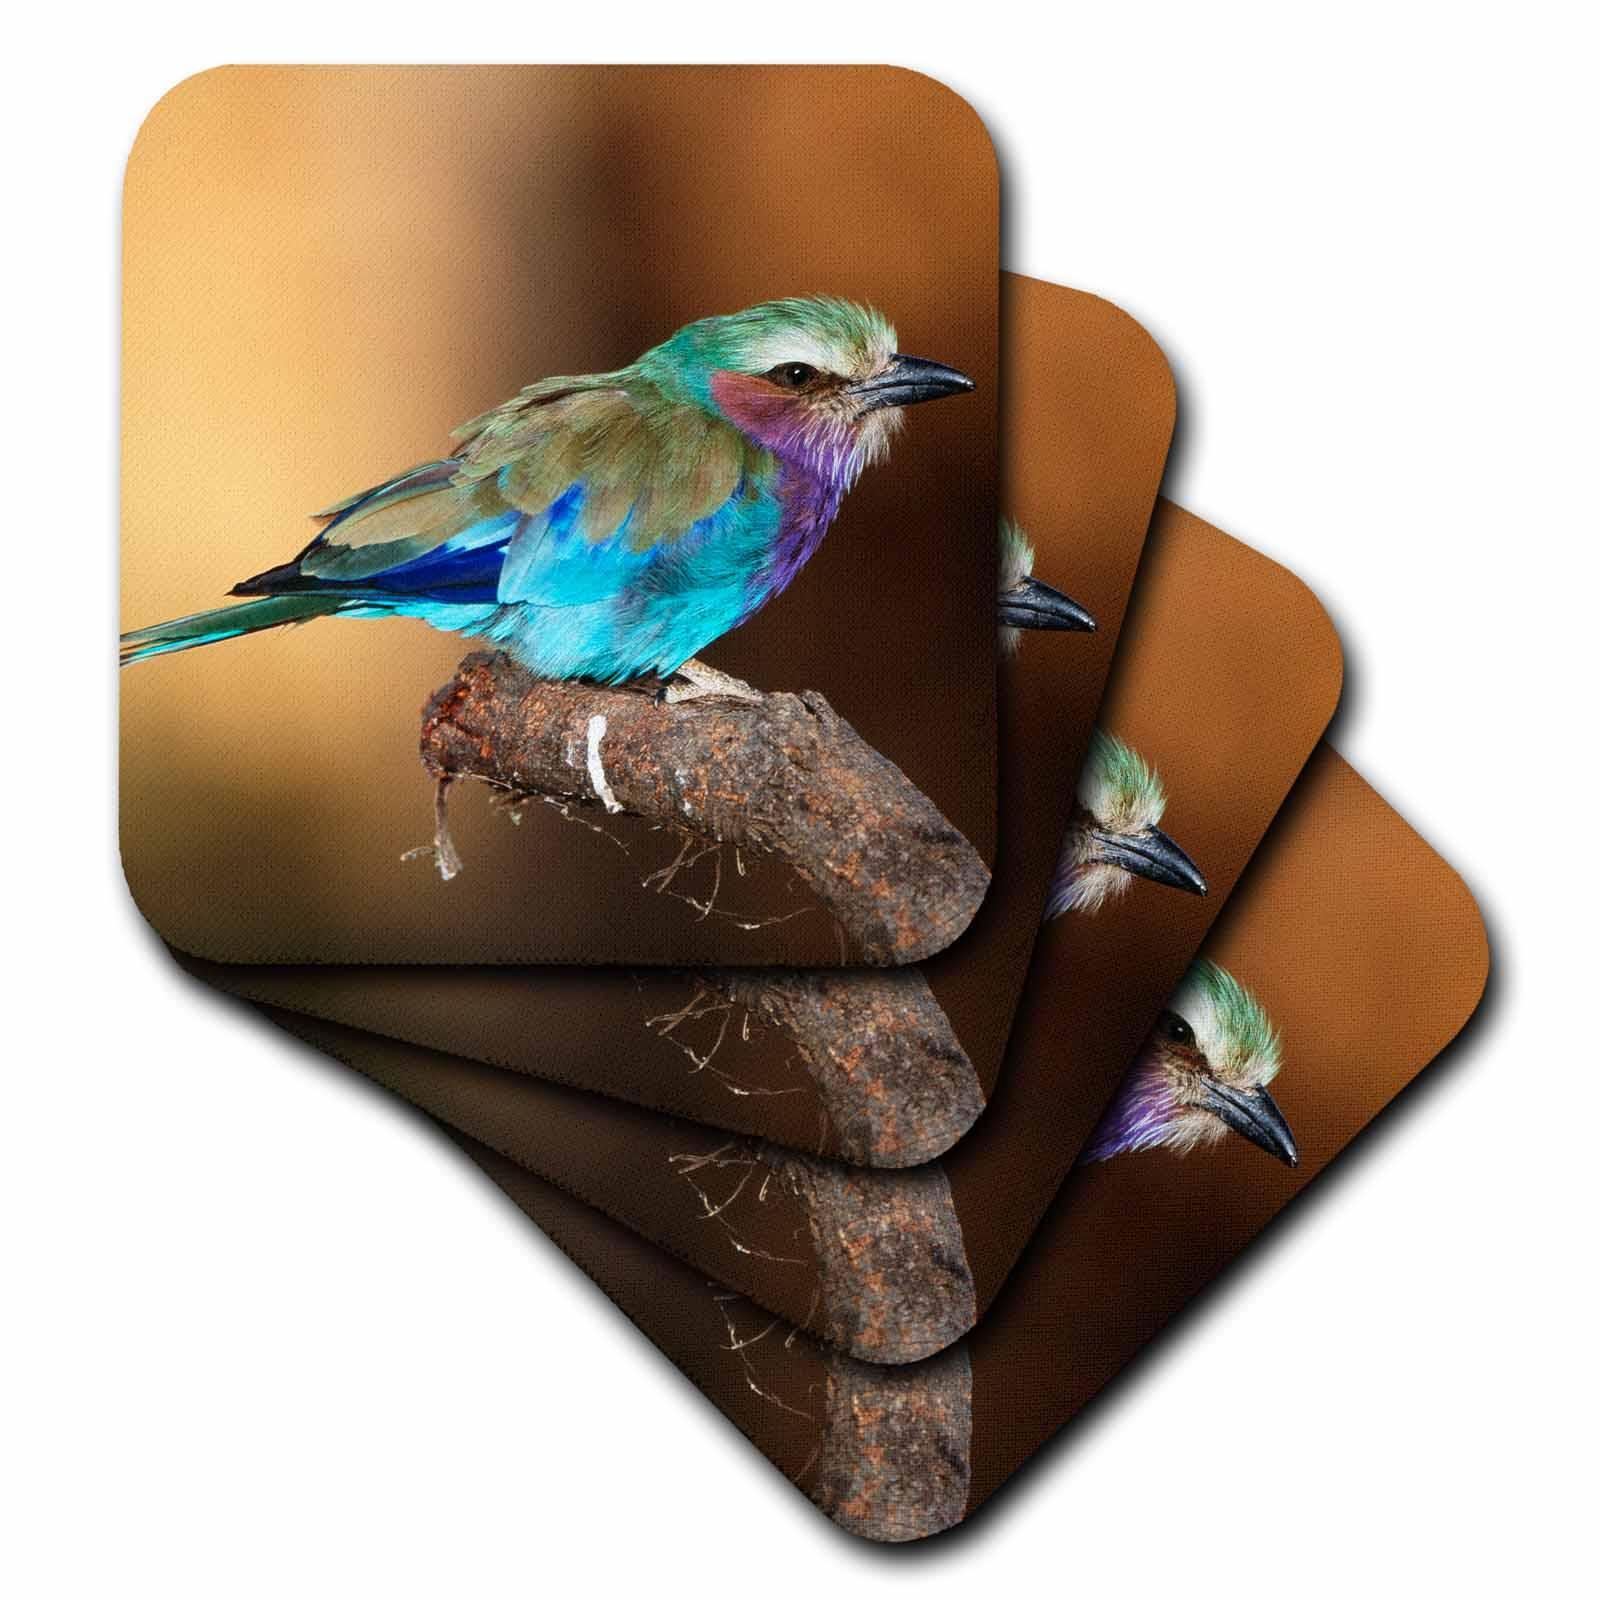 3dRose Kenya, Maasai Mara National Reserve, Lilac-Breasted Roller perching., Ceramic Tile Coasters, set of 4